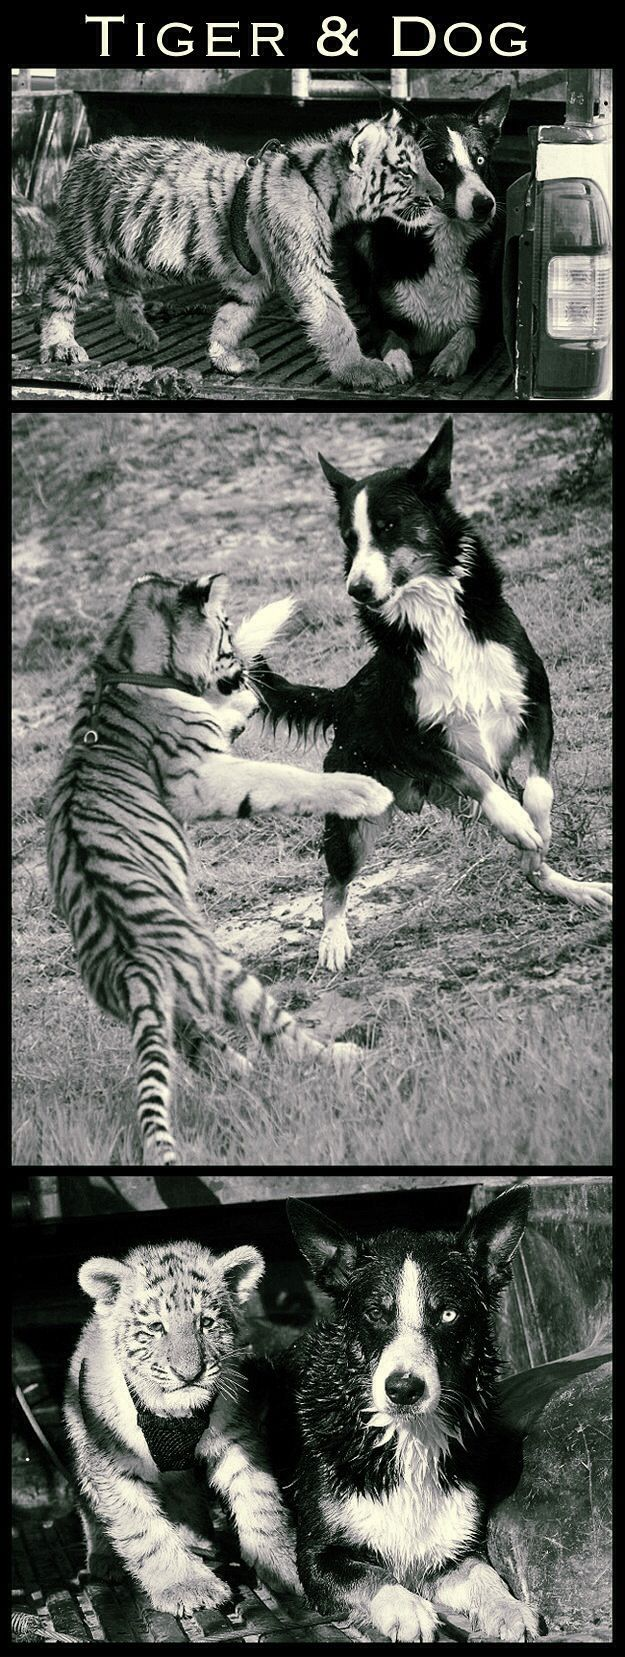 M.           buzzfeed.com/     summeranne/interspecies-friendships-of-the-year?